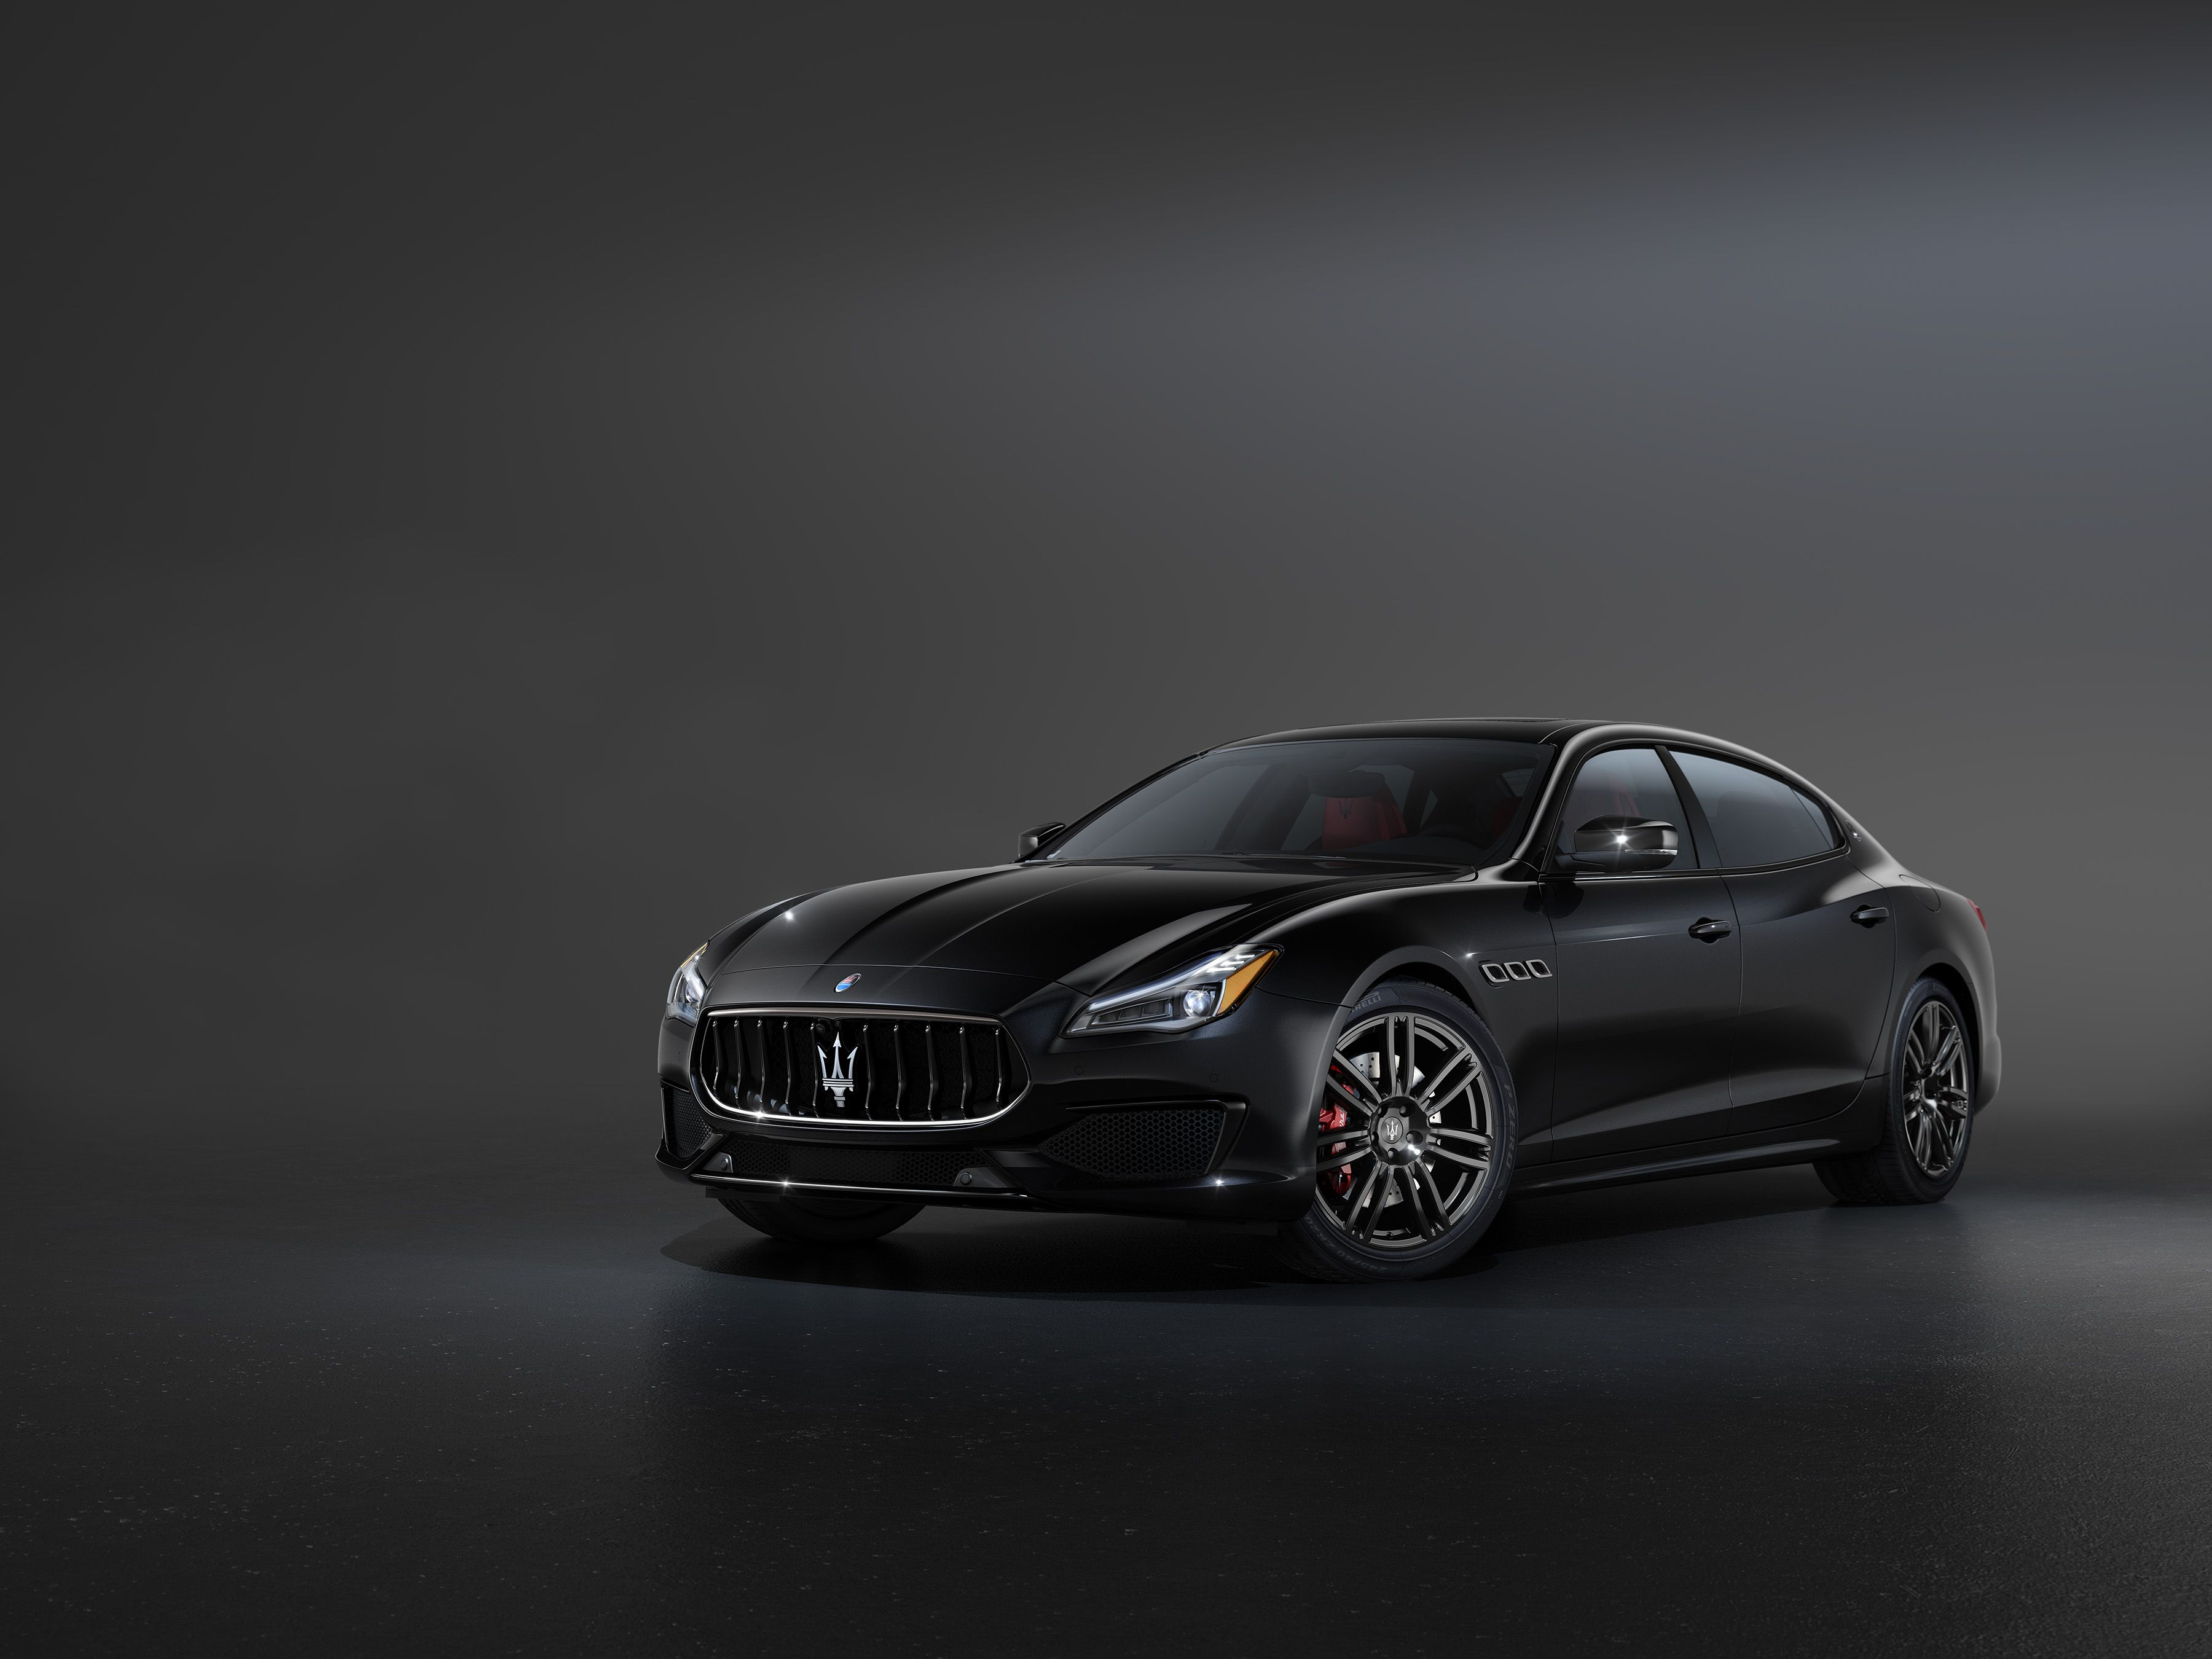 2020 Maserati Quattroporte Review Pricing and Specs 3600x2700